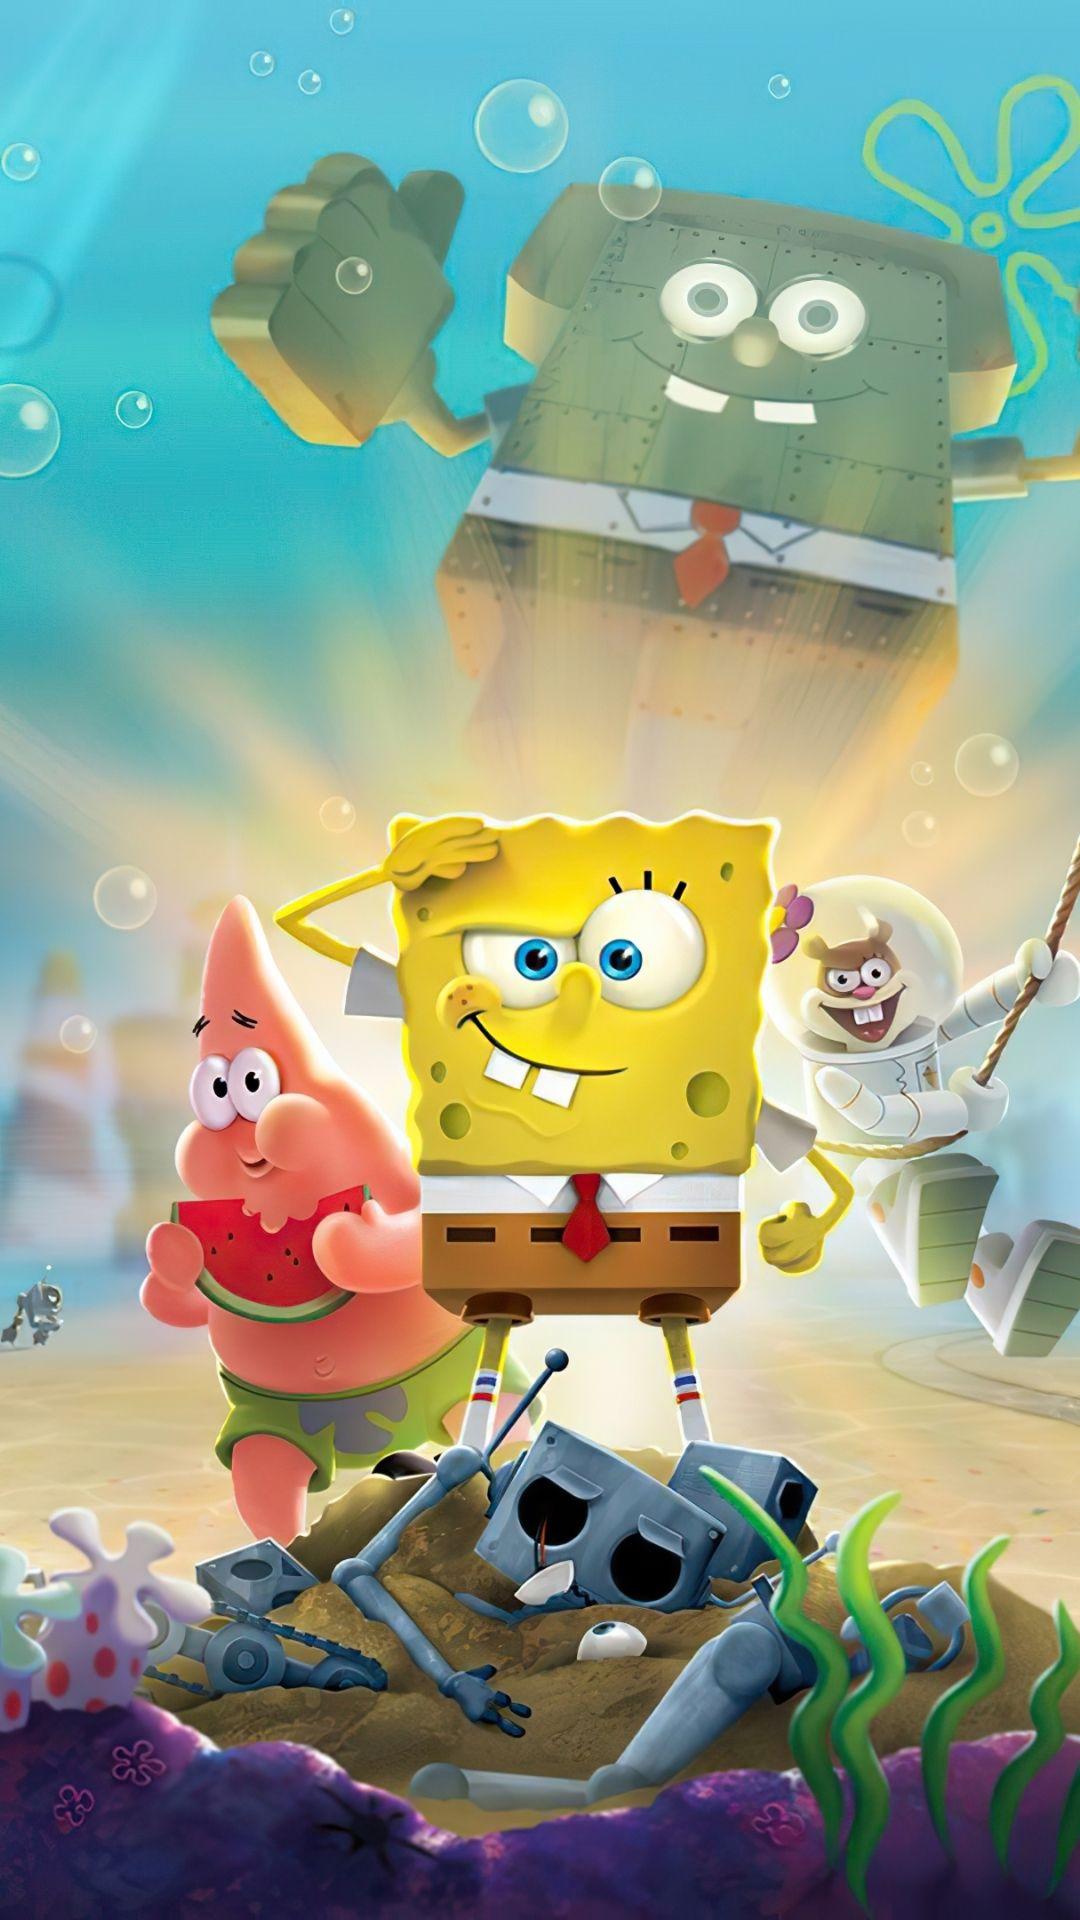 SpongeBob SquarePants, underwater, cartoon, 1080x1920 wallpaper